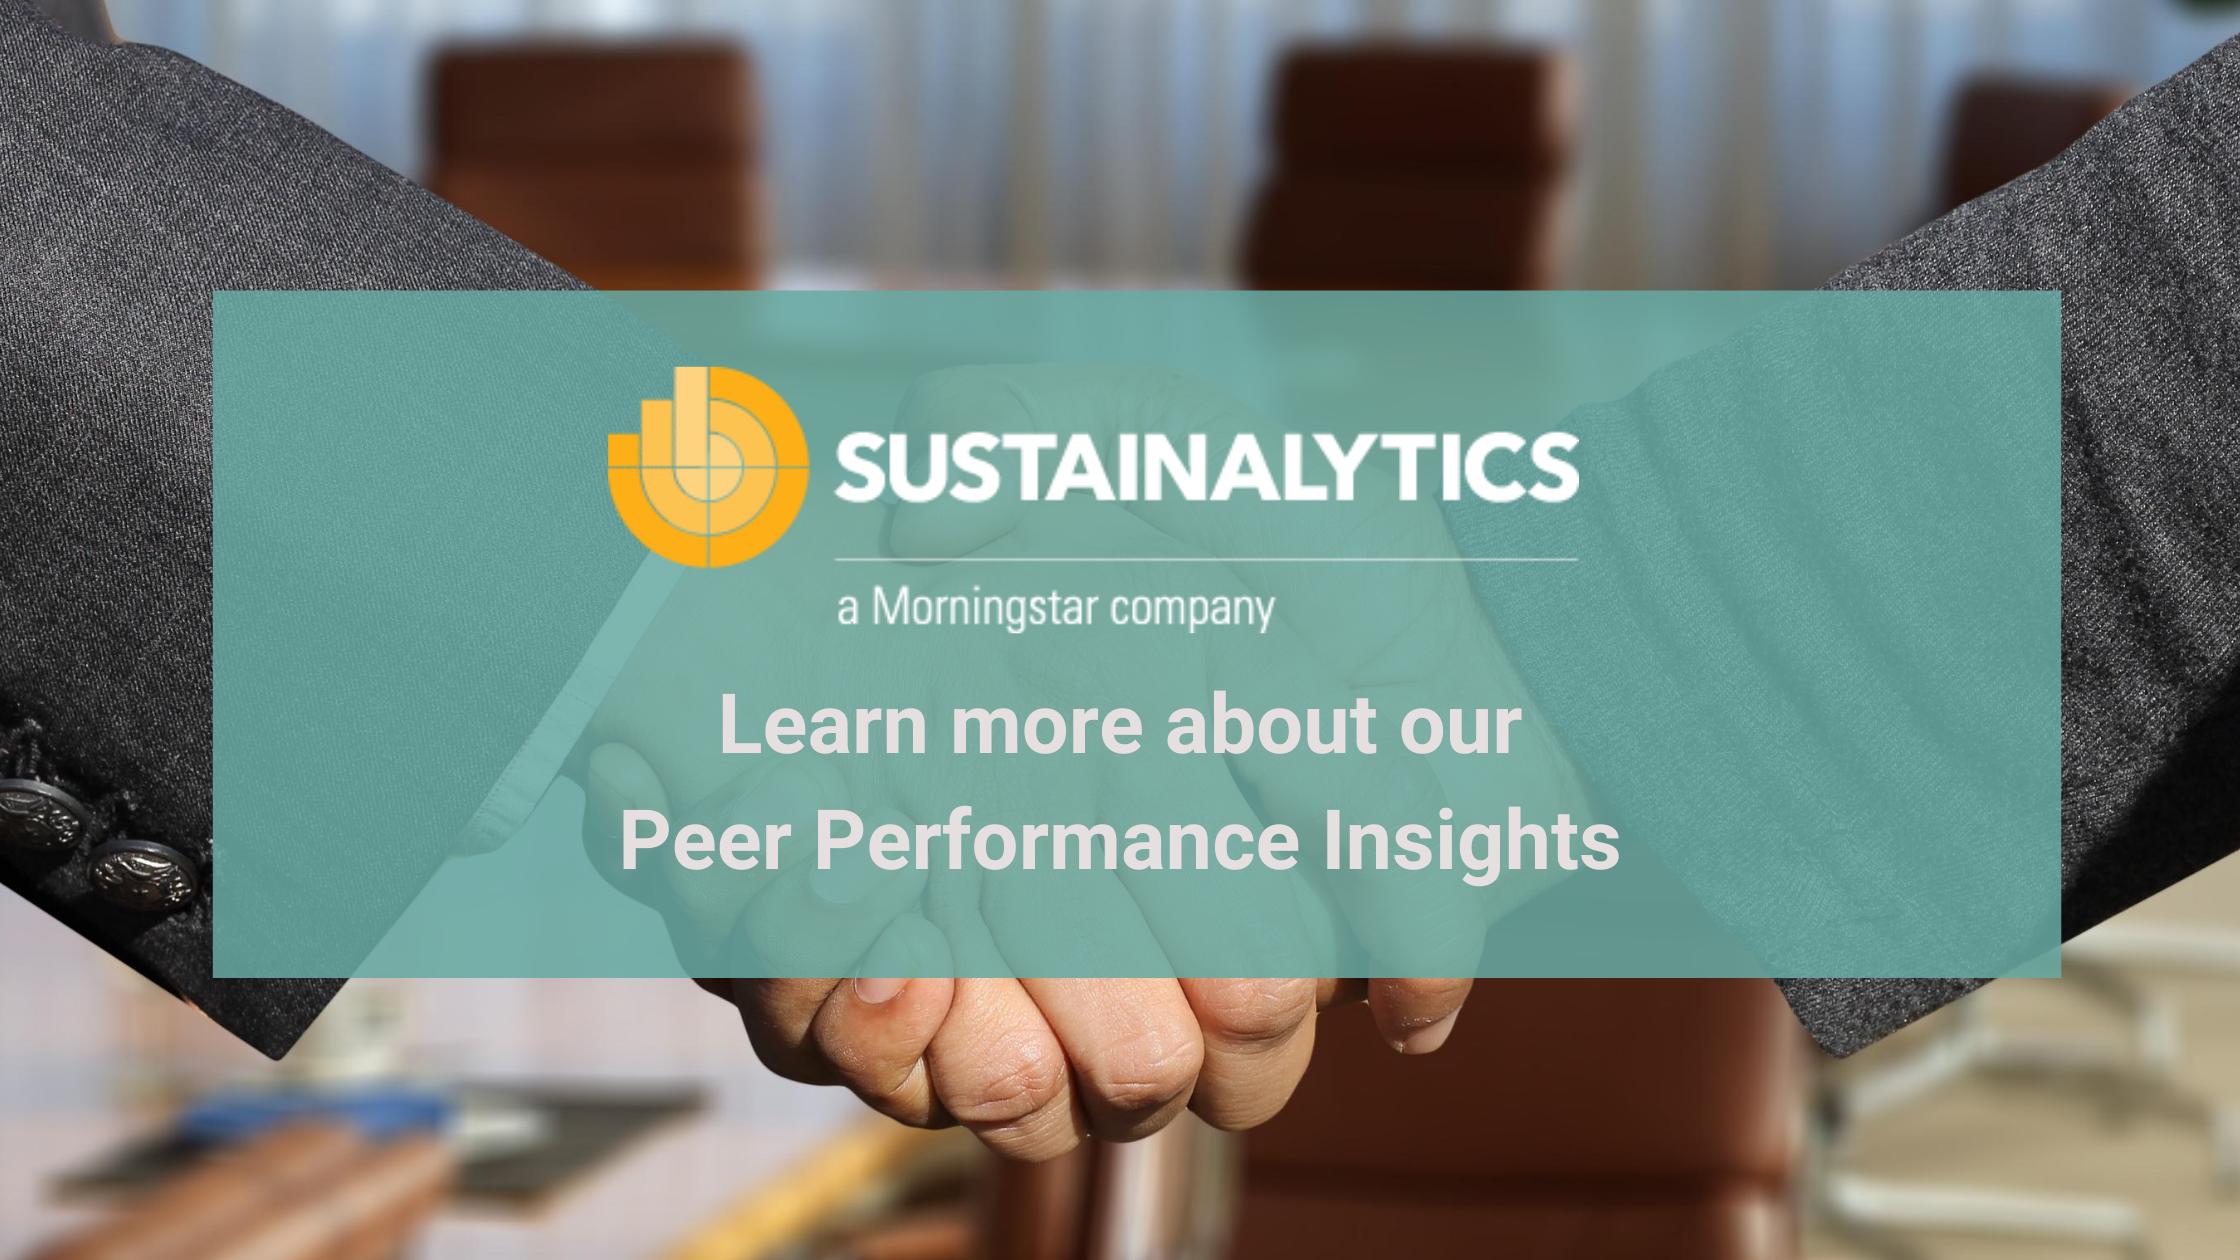 Peer performance insights